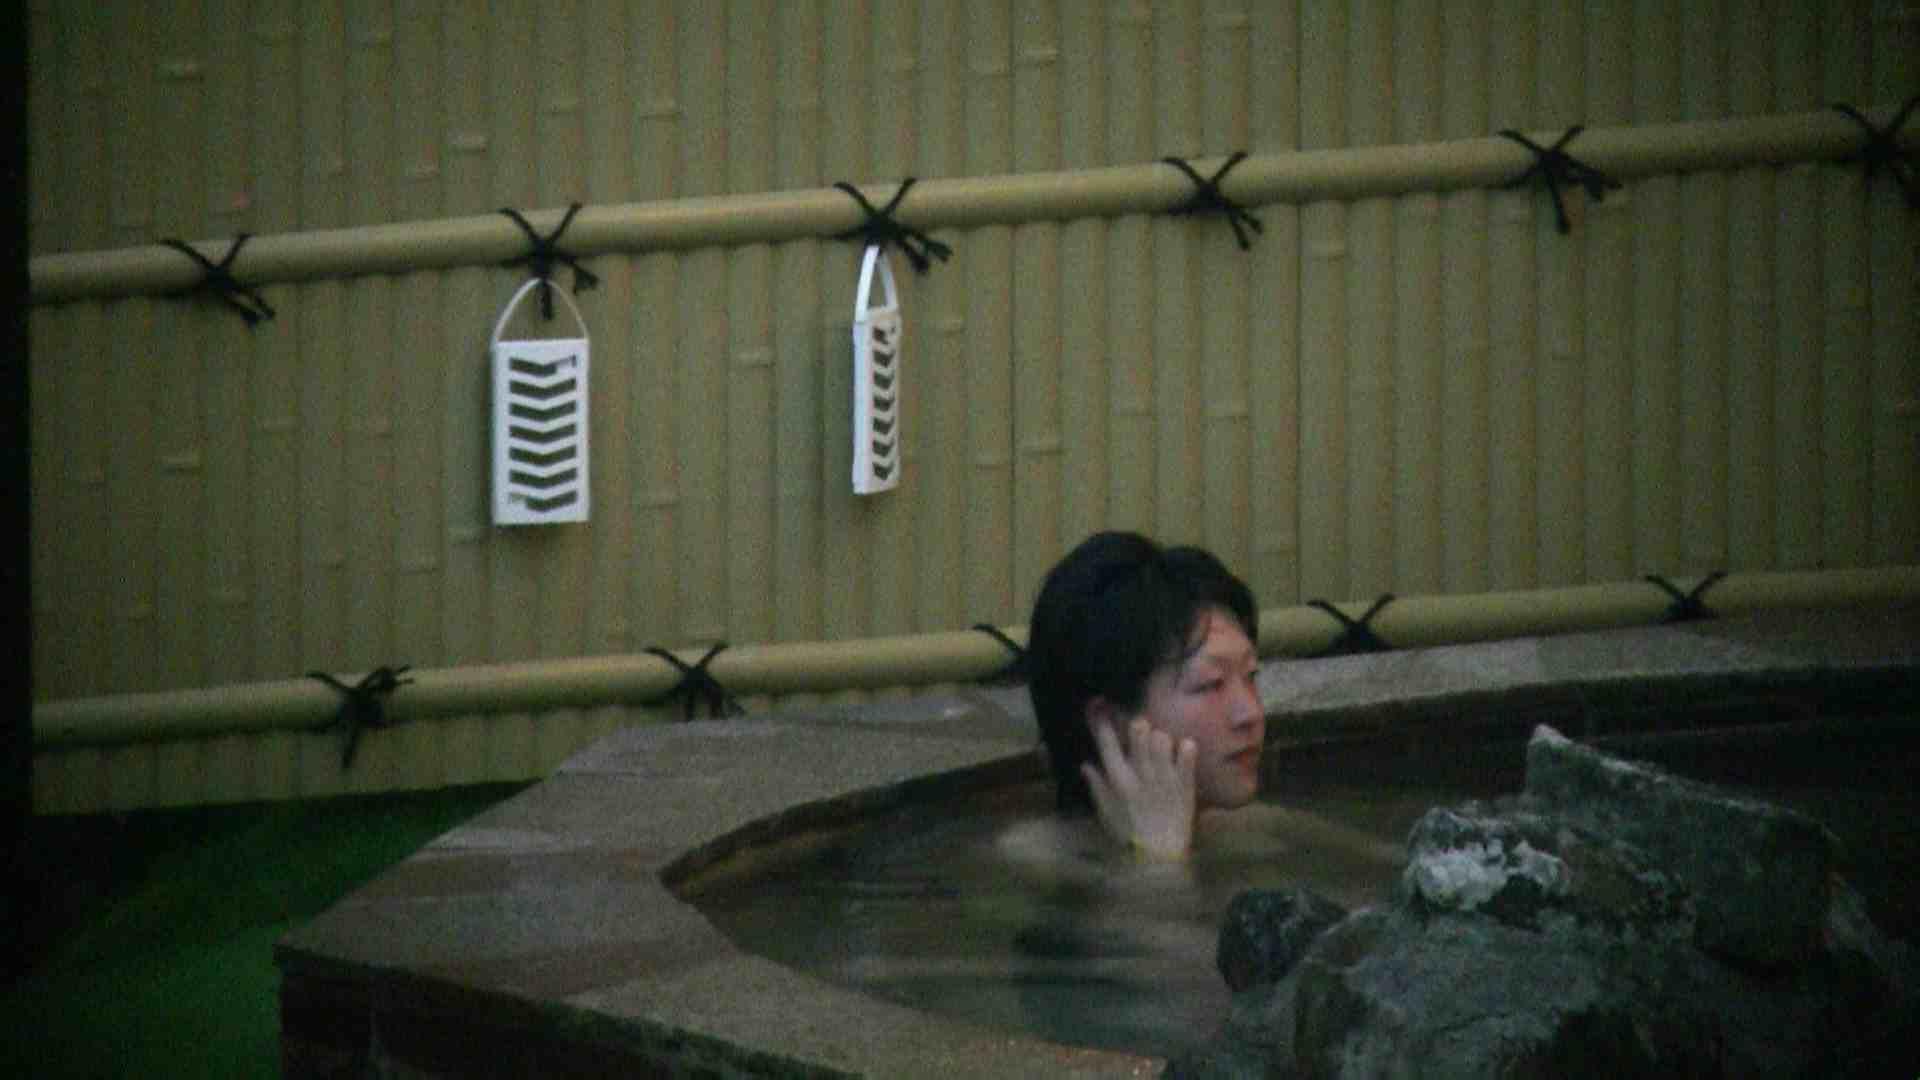 Aquaな露天風呂Vol.05【VIP】 露天風呂編  112PIX 60